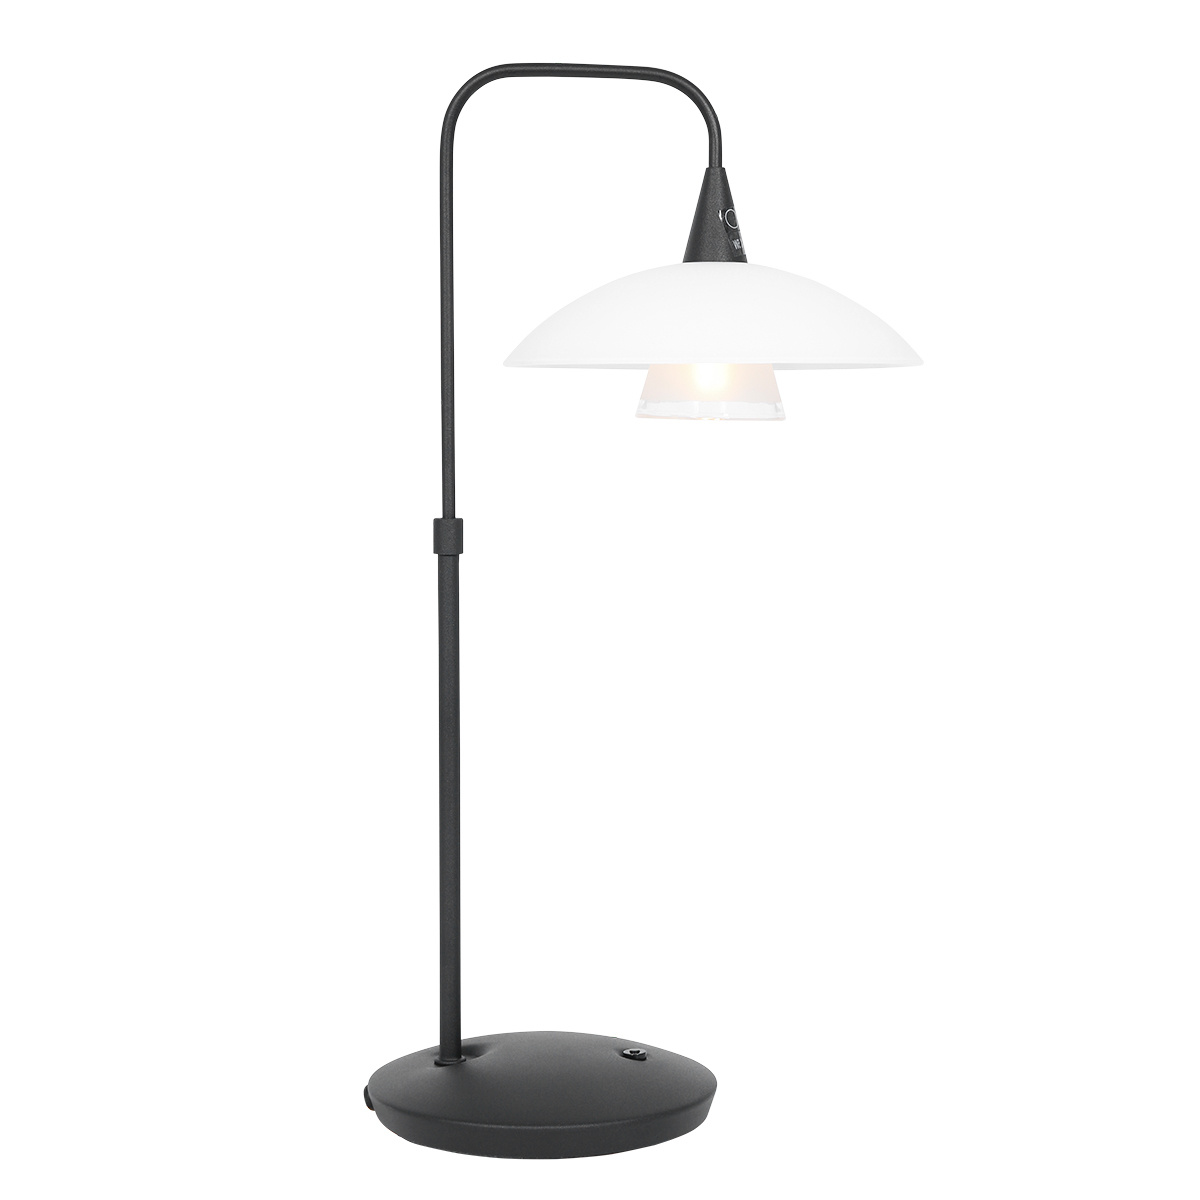 Steinhauer Tafellamp tallerken LED 2657zw zwart